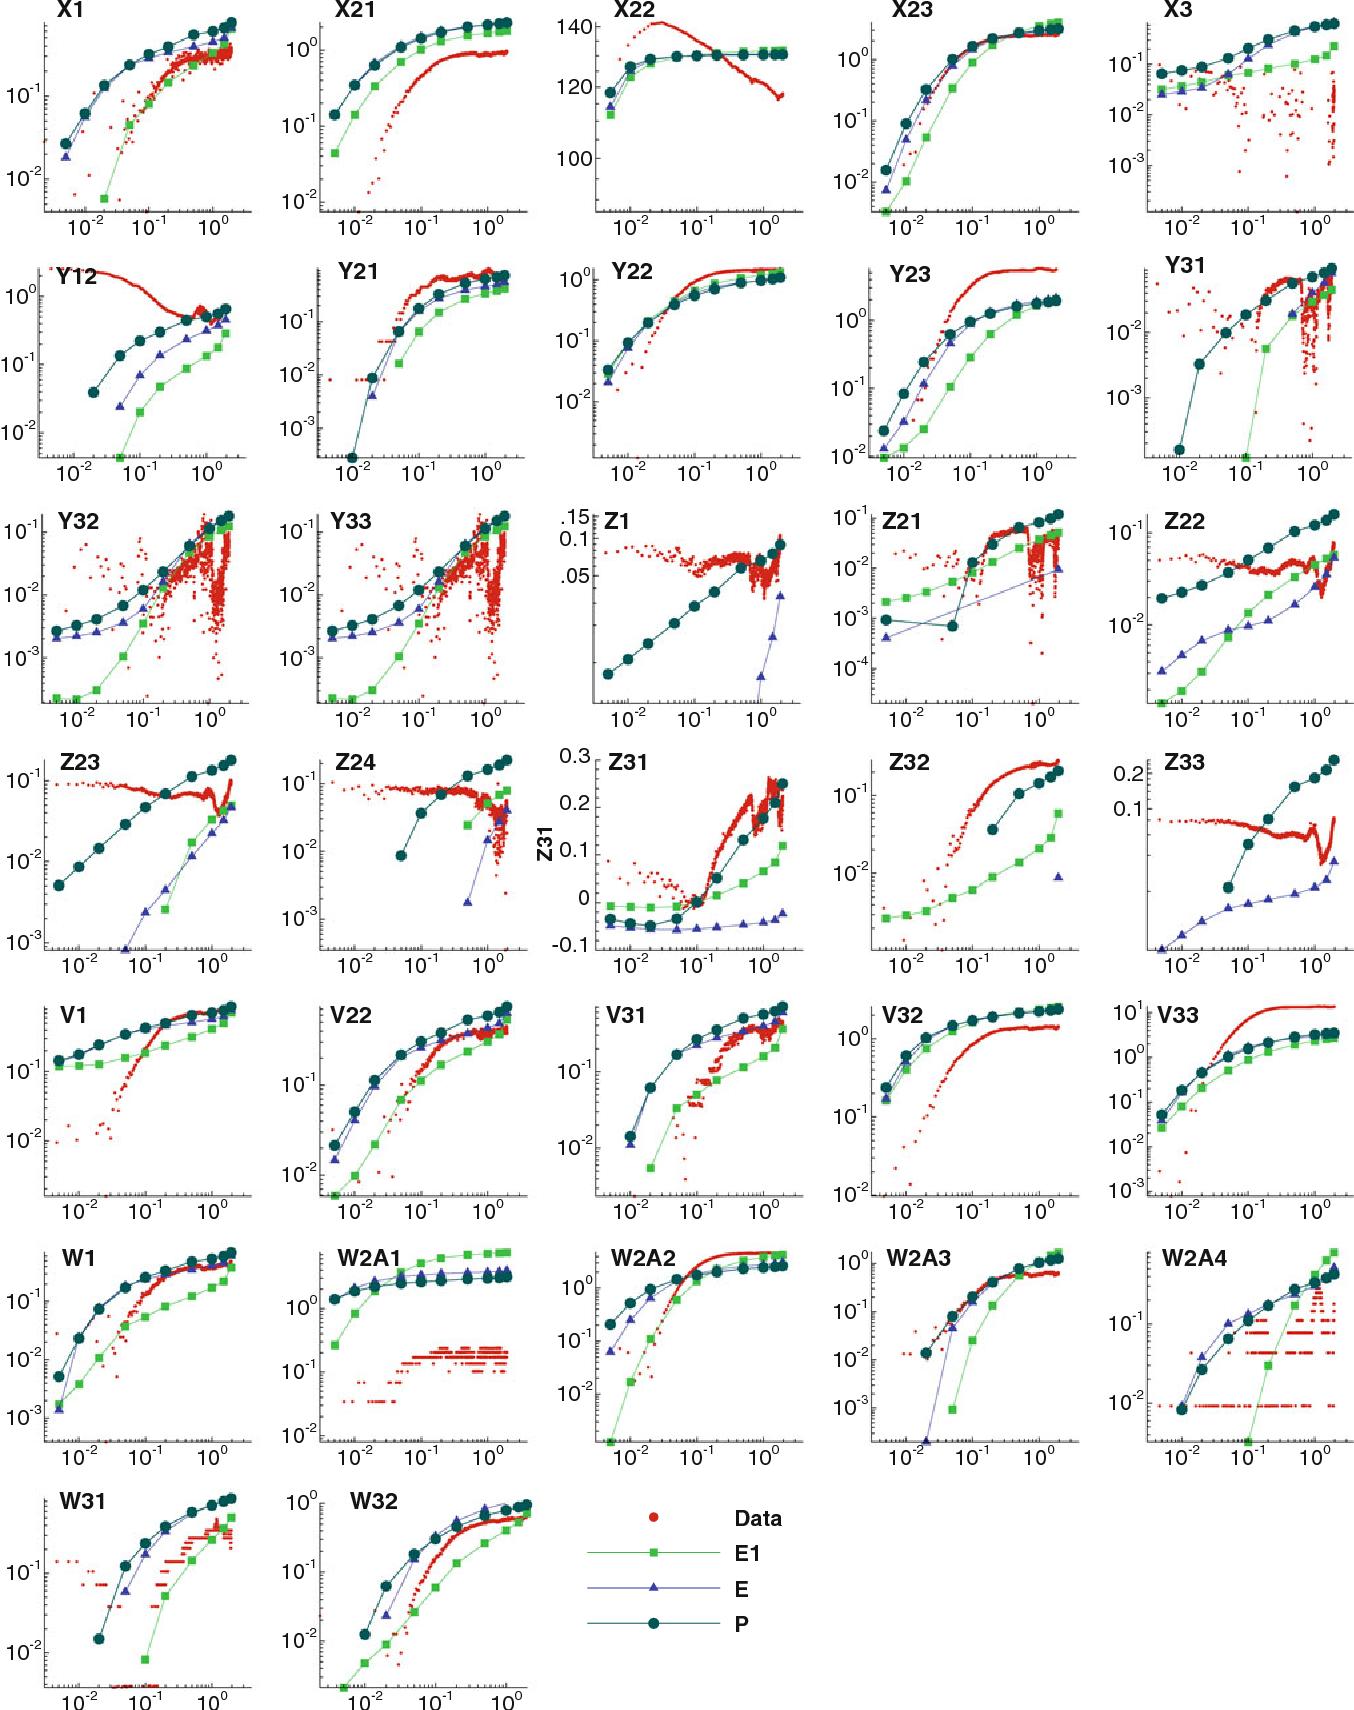 Maximum likelihood Bayesian averaging of airflow models in